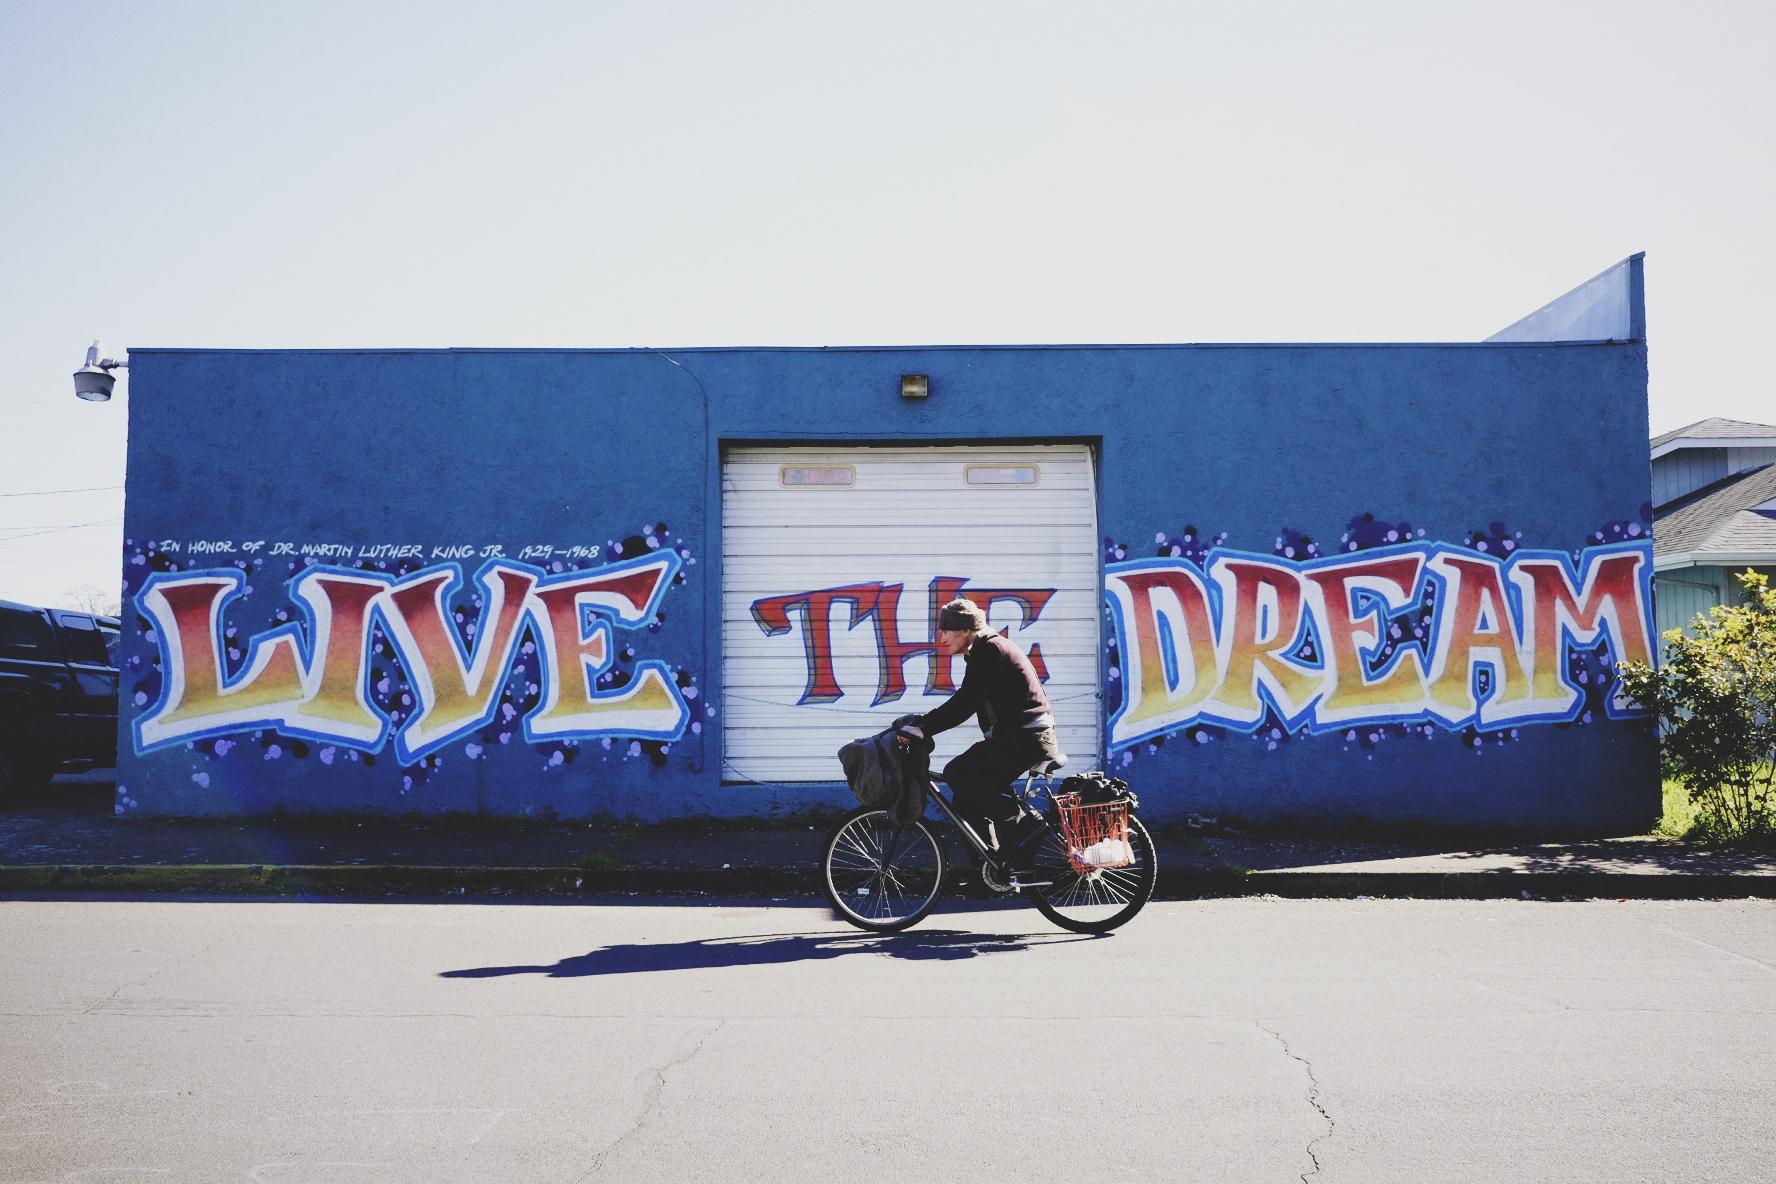 92. Live The Dream